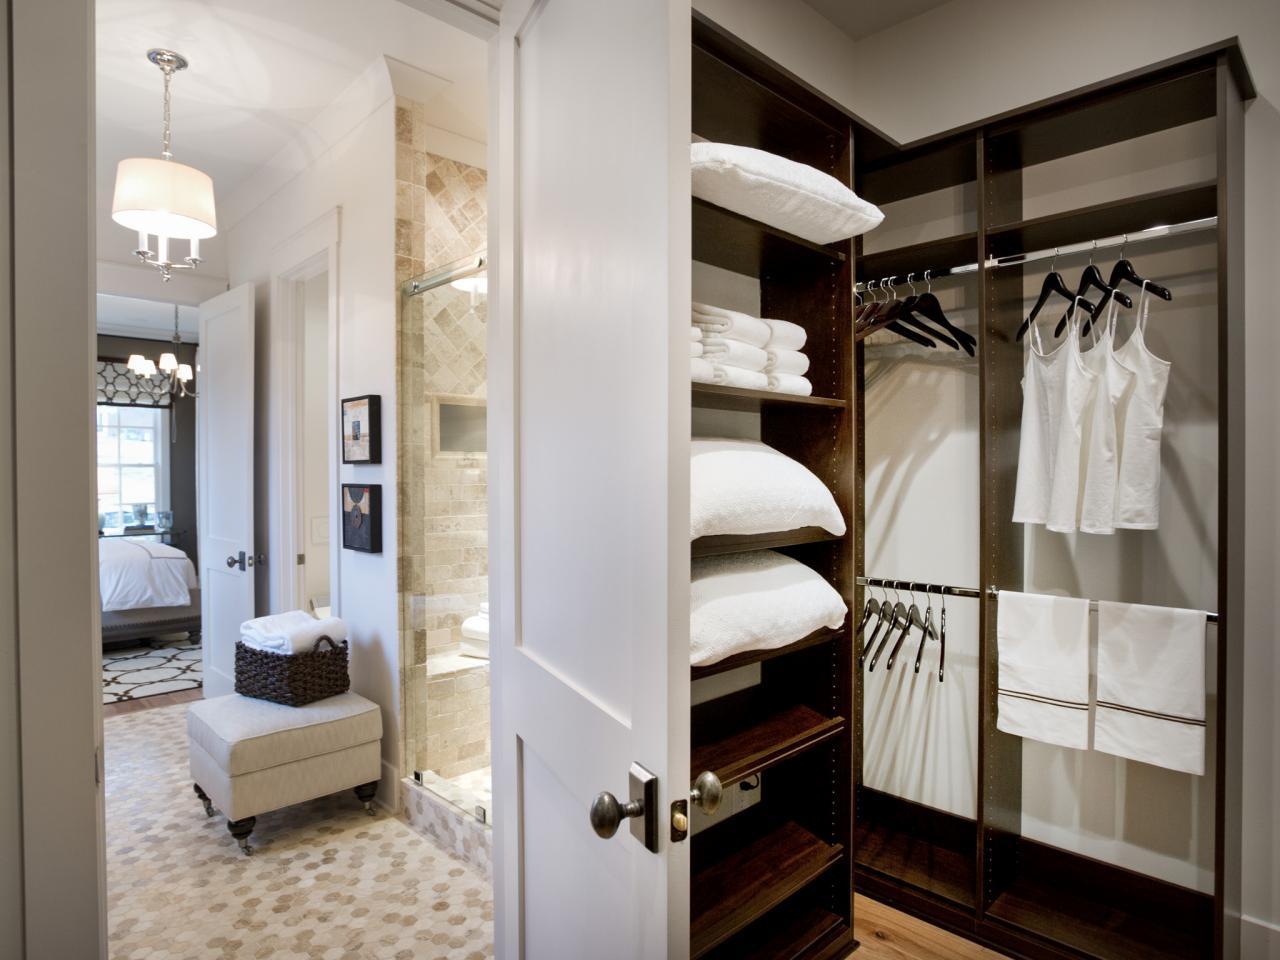 Photos hgtv for Master bath and closet ideas